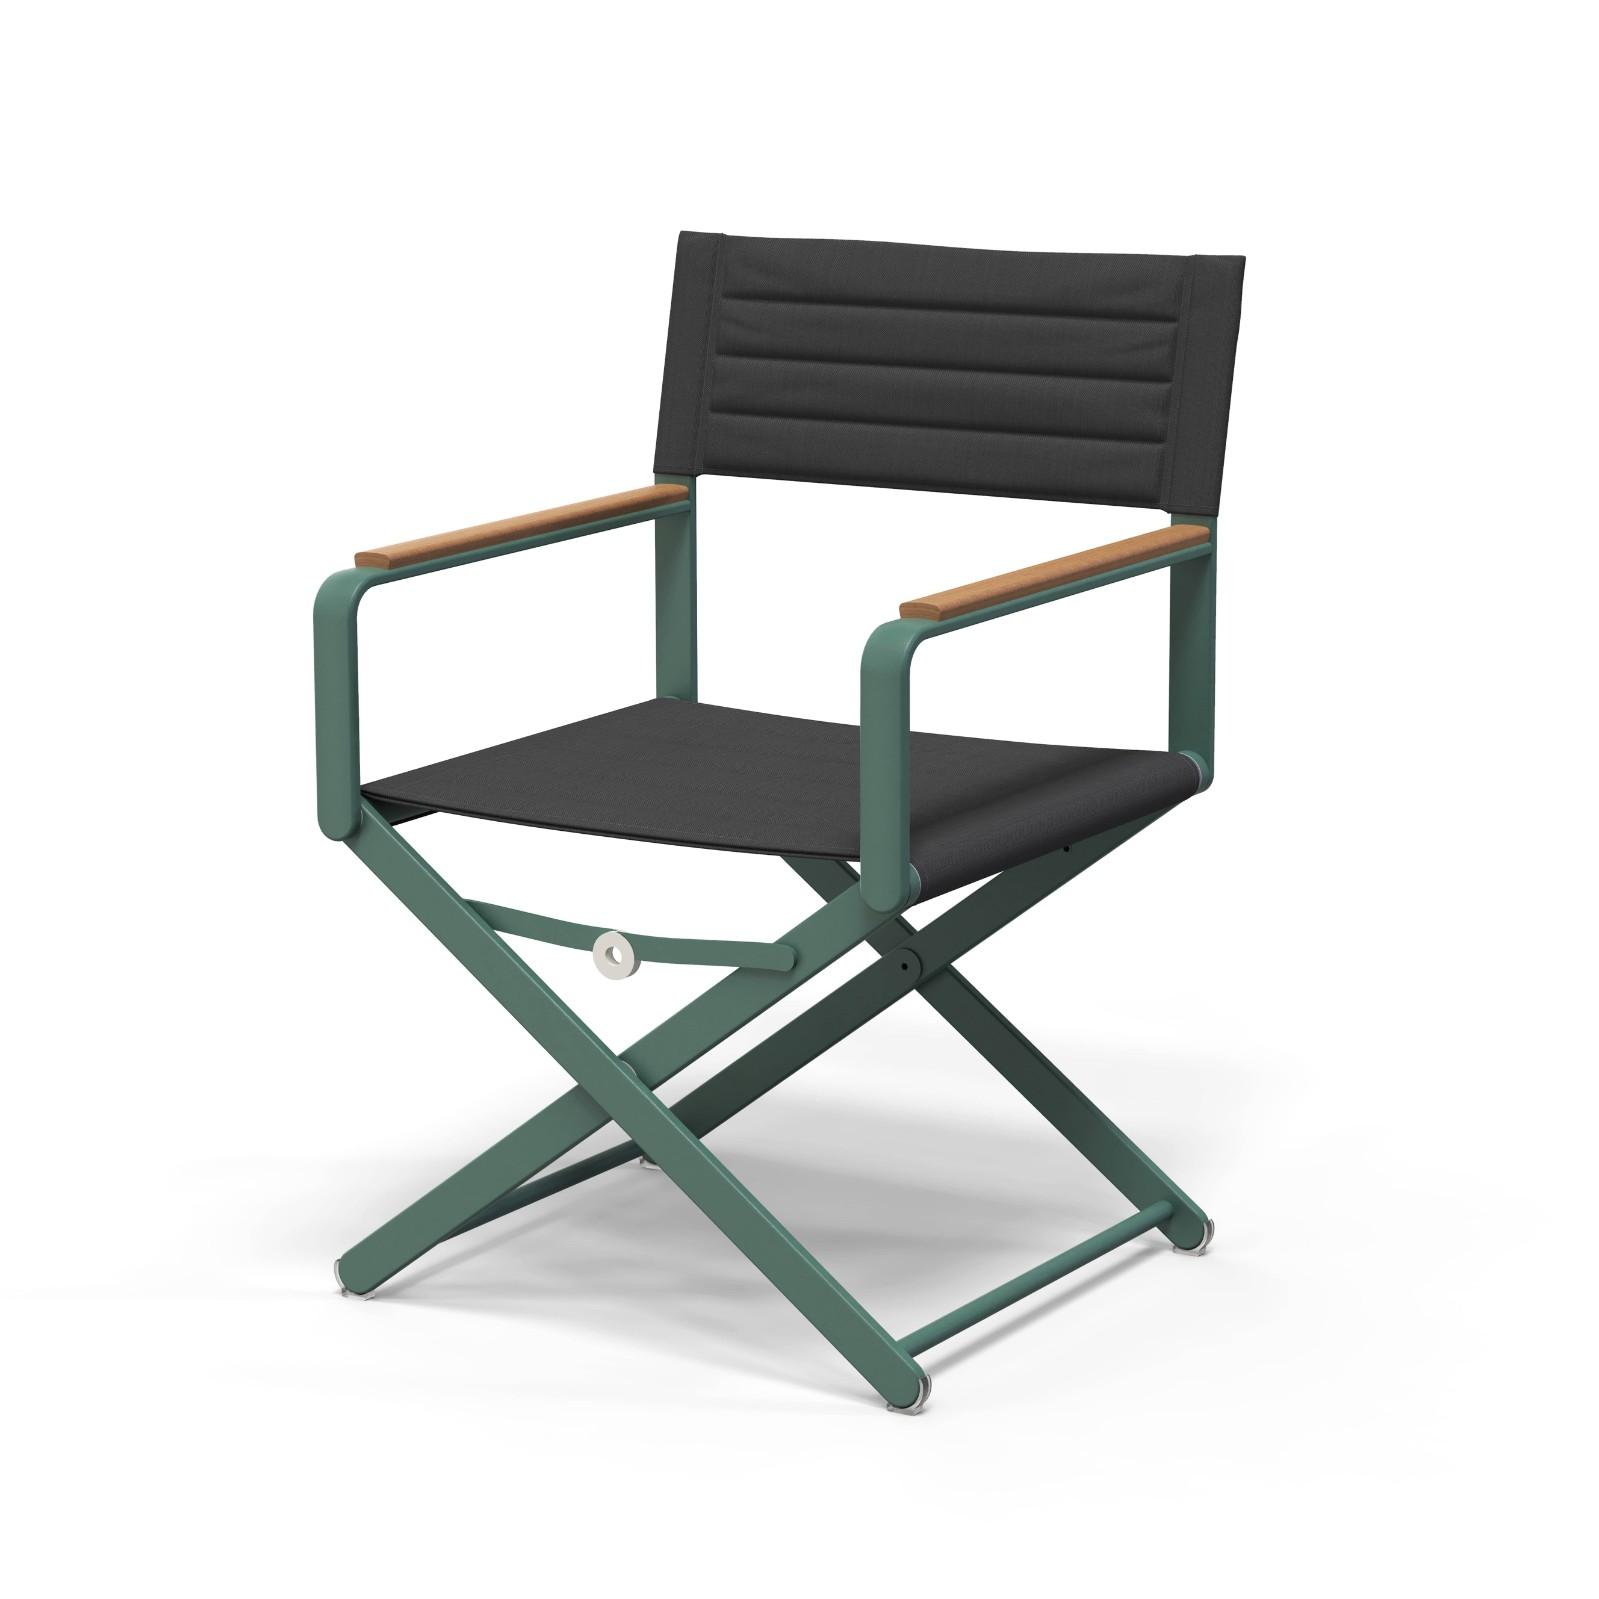 KUNDESIGN - 新品Chic折叠椅